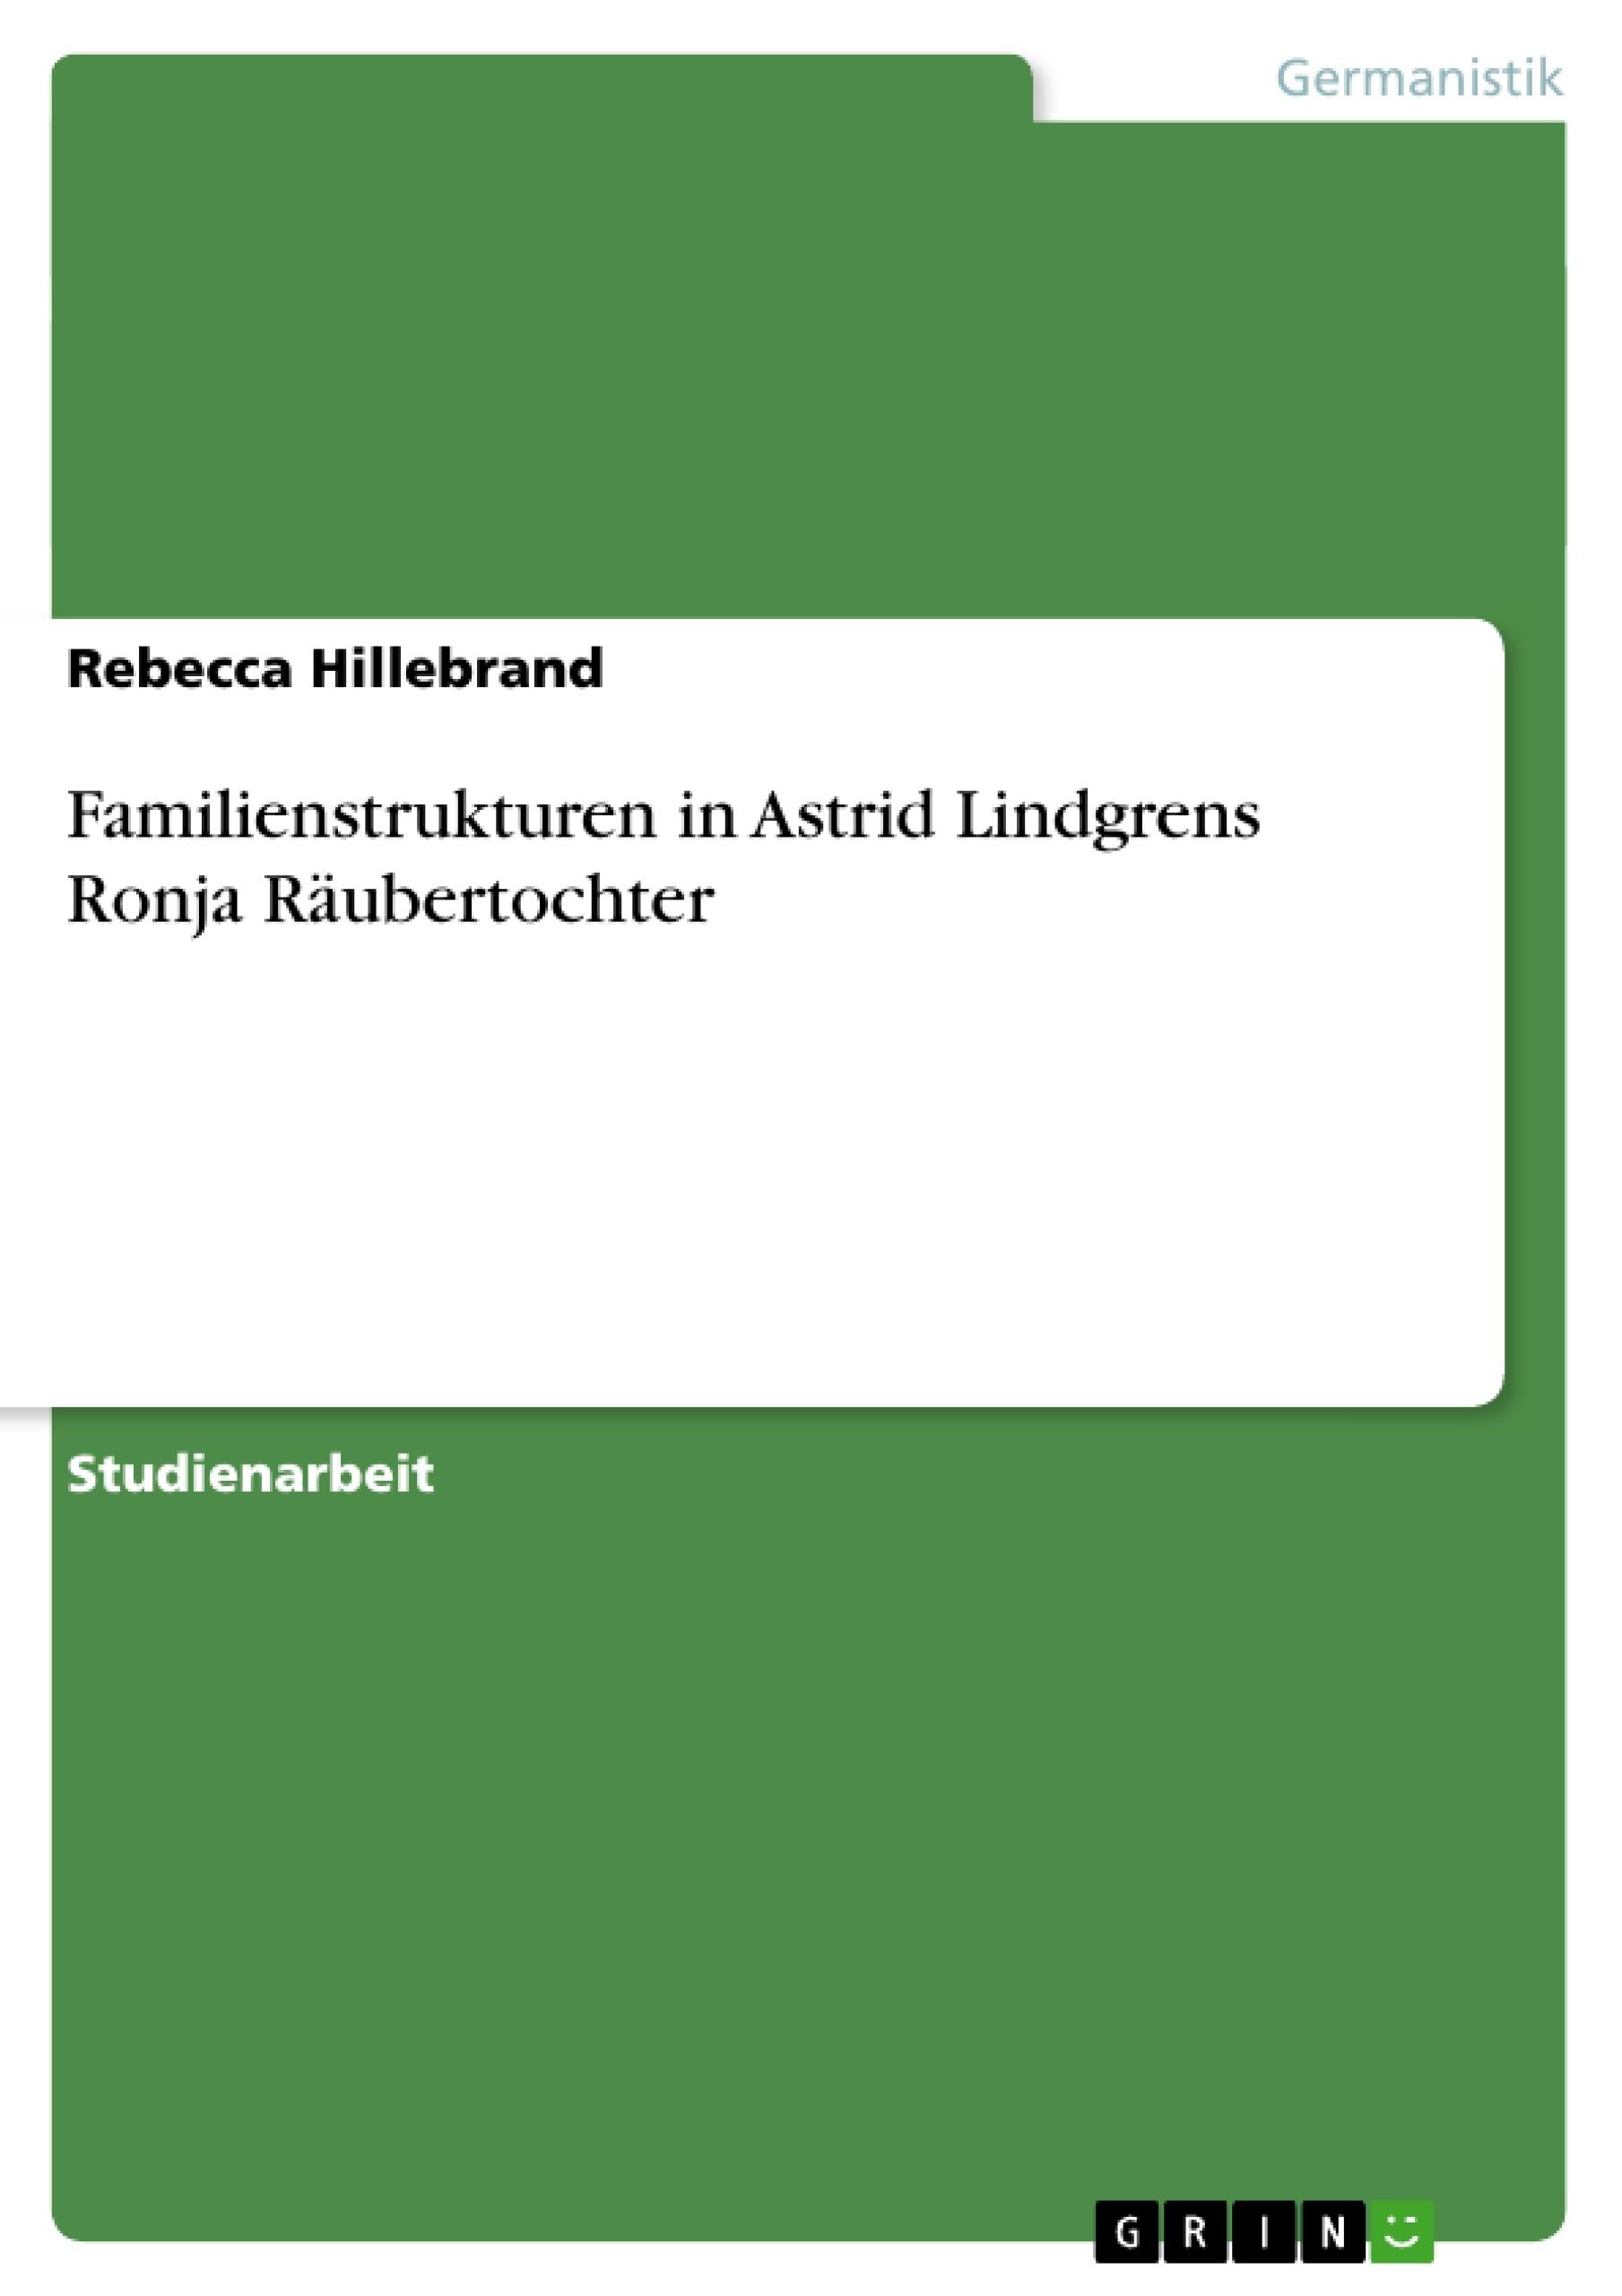 Titel: Familienstrukturen in Astrid Lindgrens Ronja Räubertochter